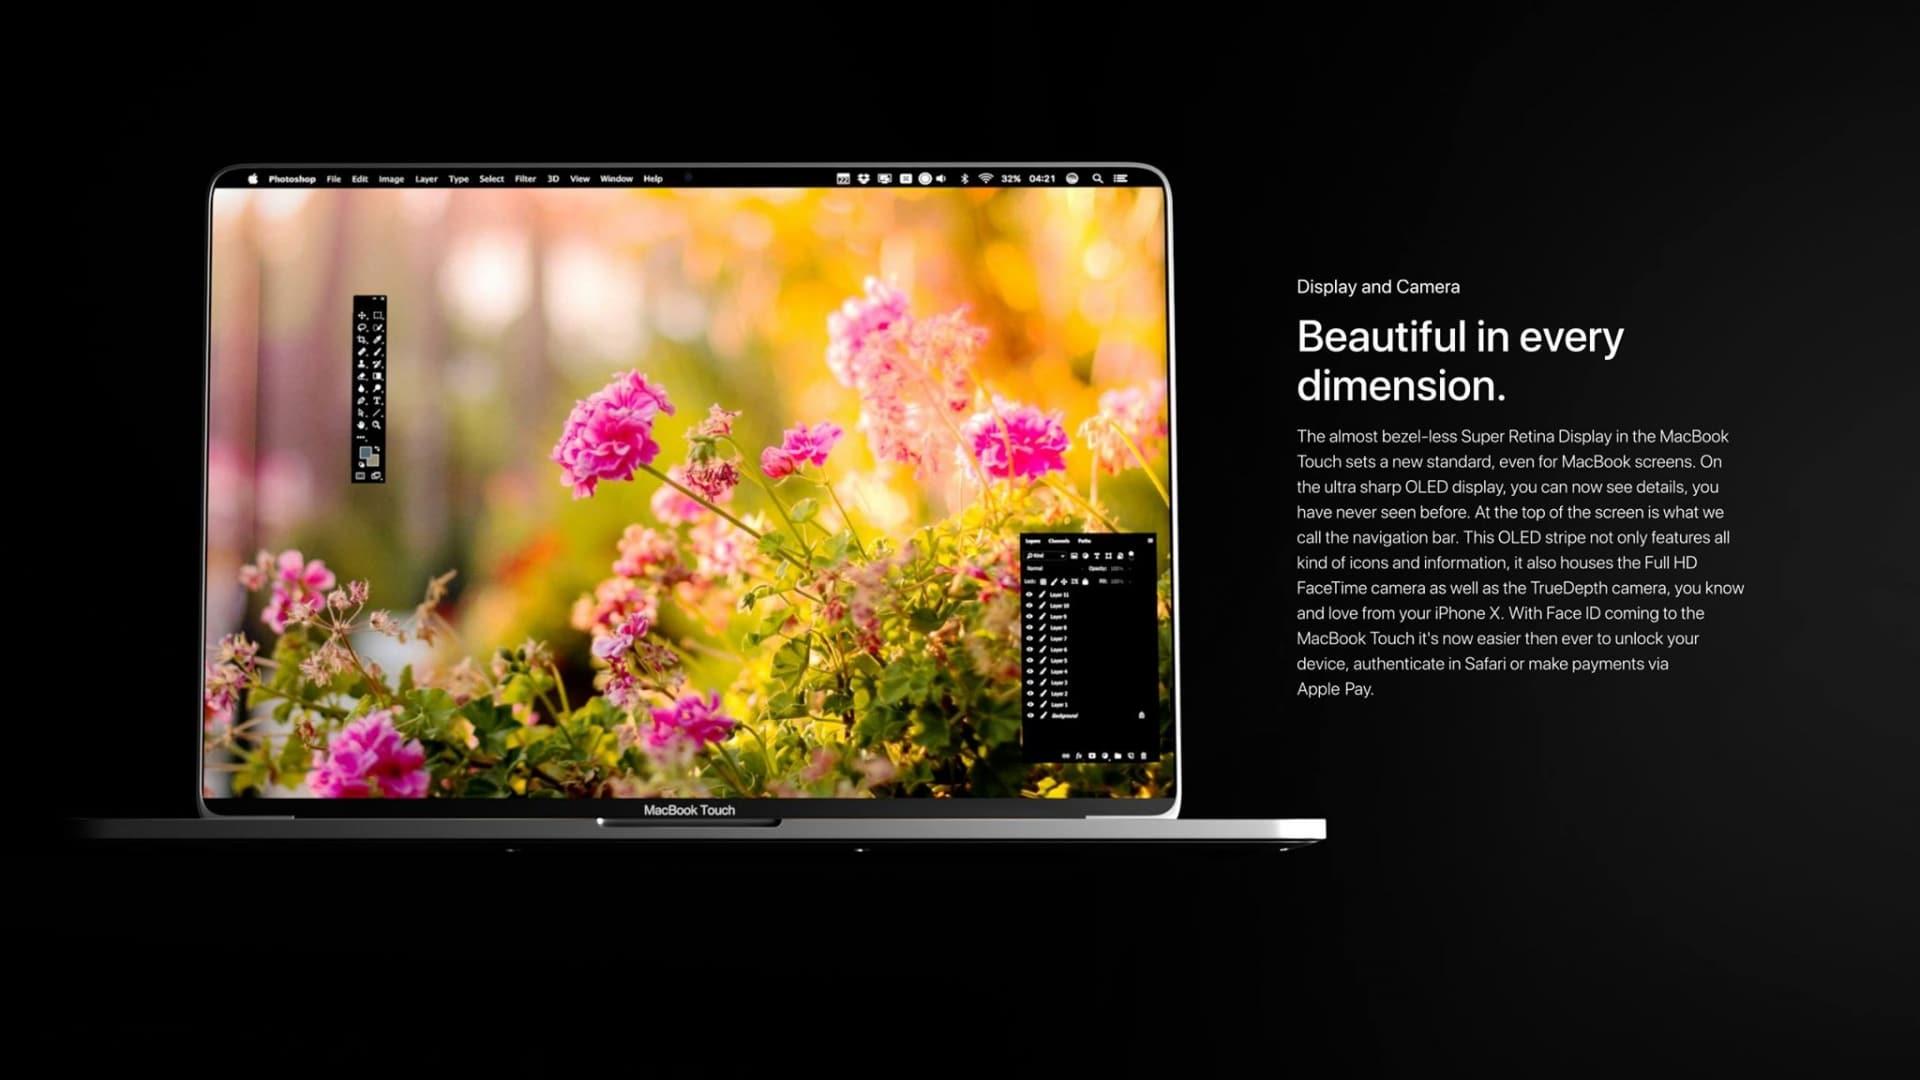 touchscreen-macbook-touchscreen-mac-1